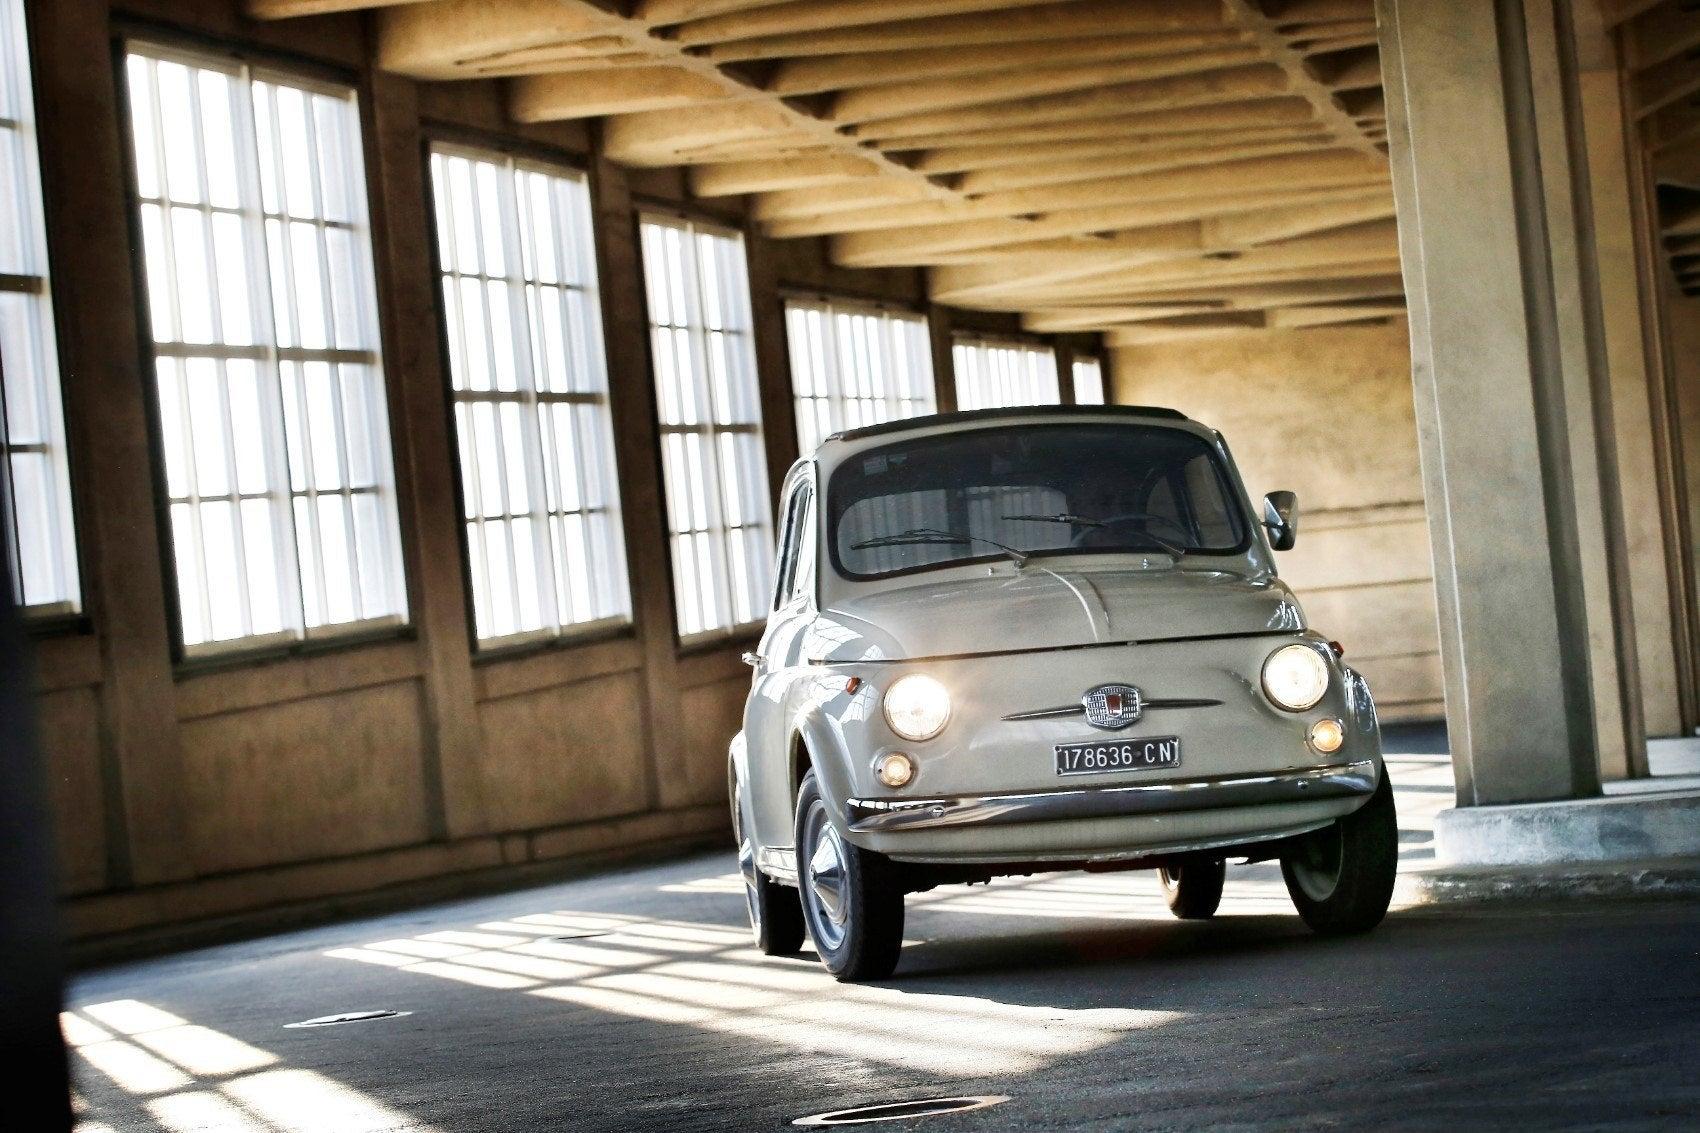 170704 Fiat 500F MoMA 01pj4vek4rj06p6b7nula31aihfc